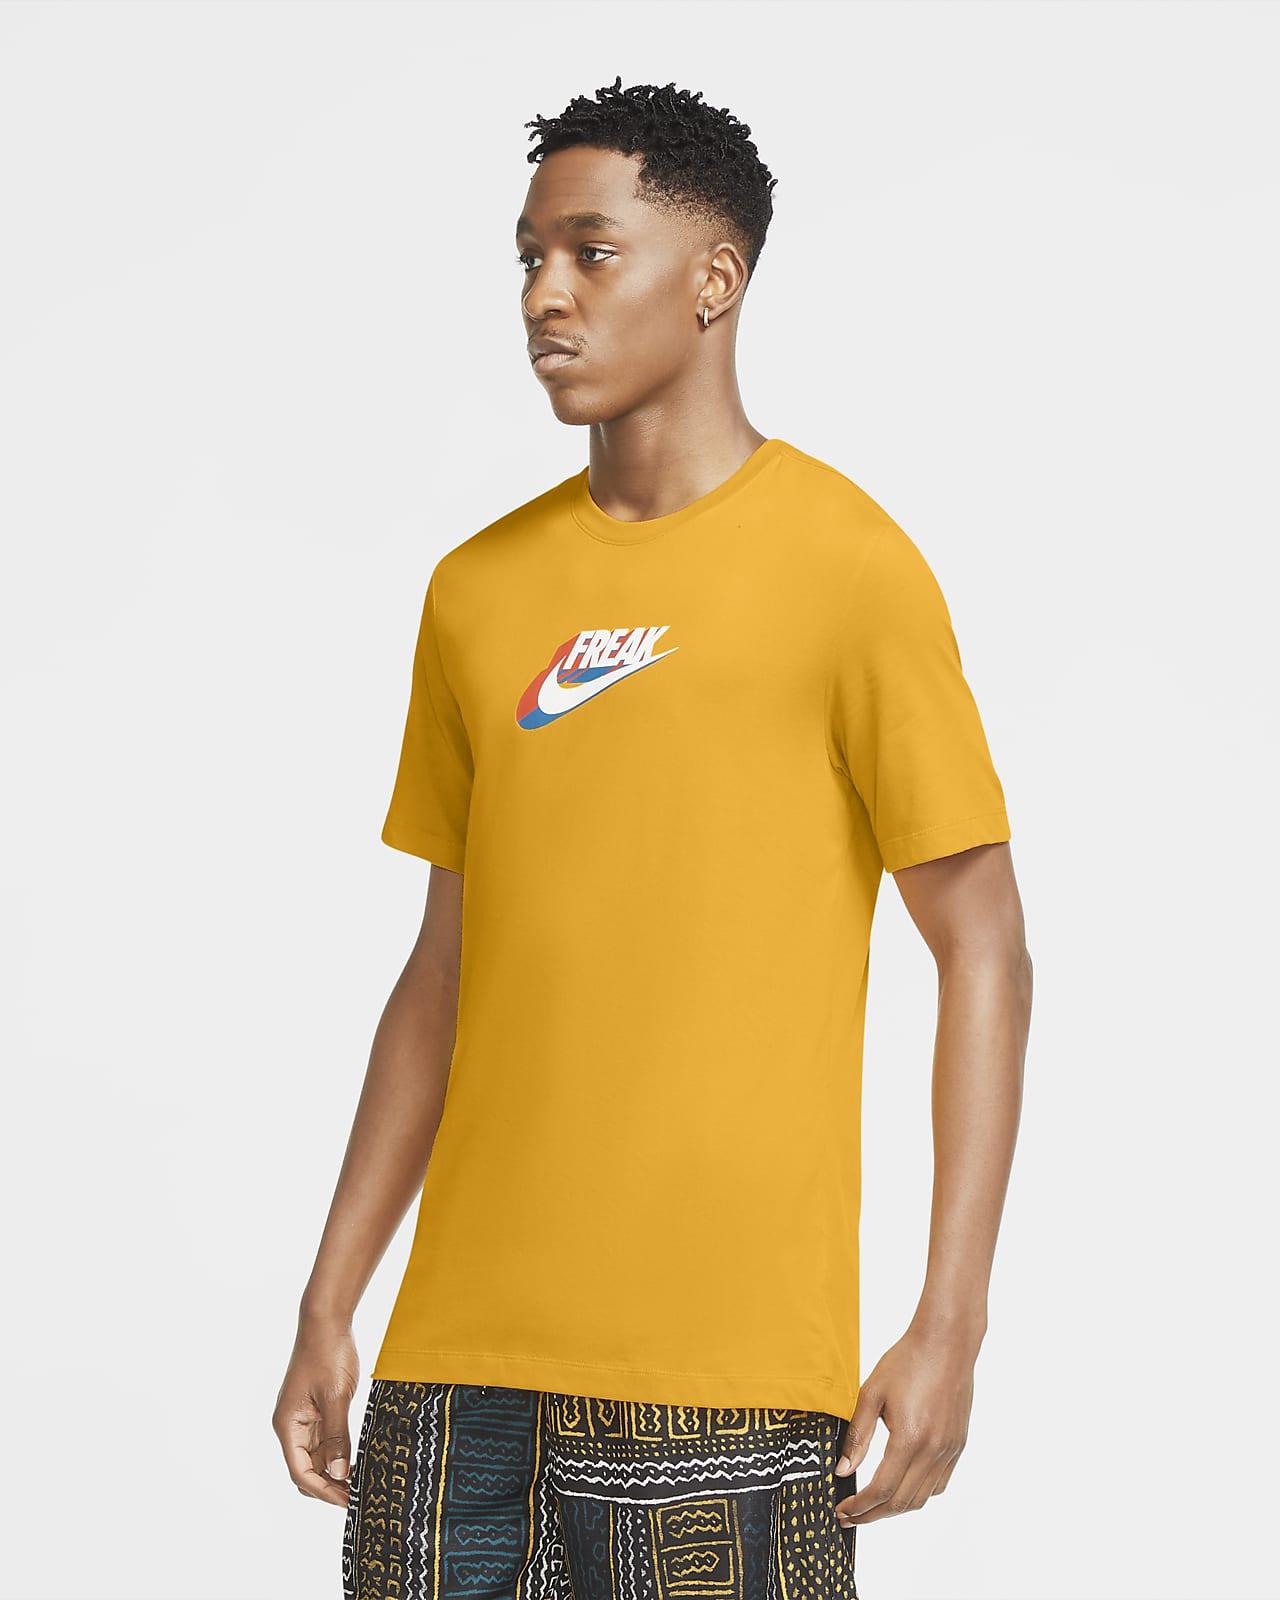 Tee-shirt Nike Dri-FIT Giannis Swoosh Freak pour Homme